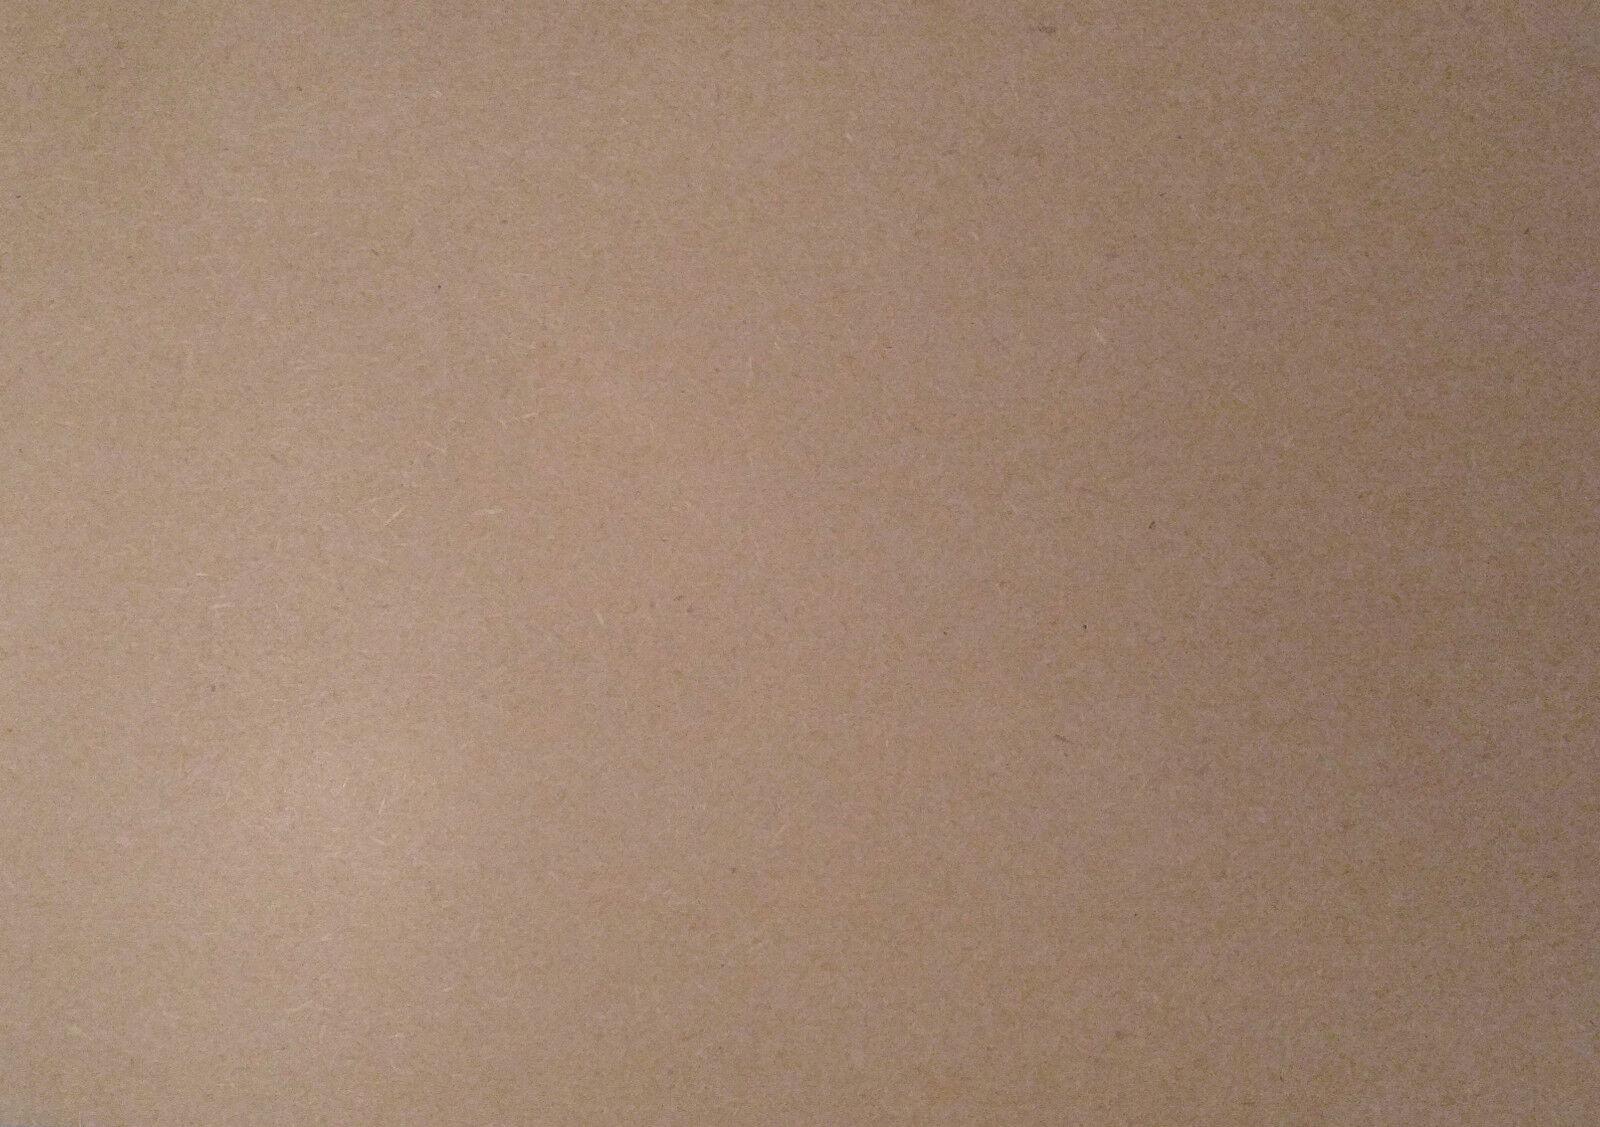 Medite MDF Lazer Board A4 Size 15 x Sheet 6mm Thick x 297mm Long x 210mm Wide